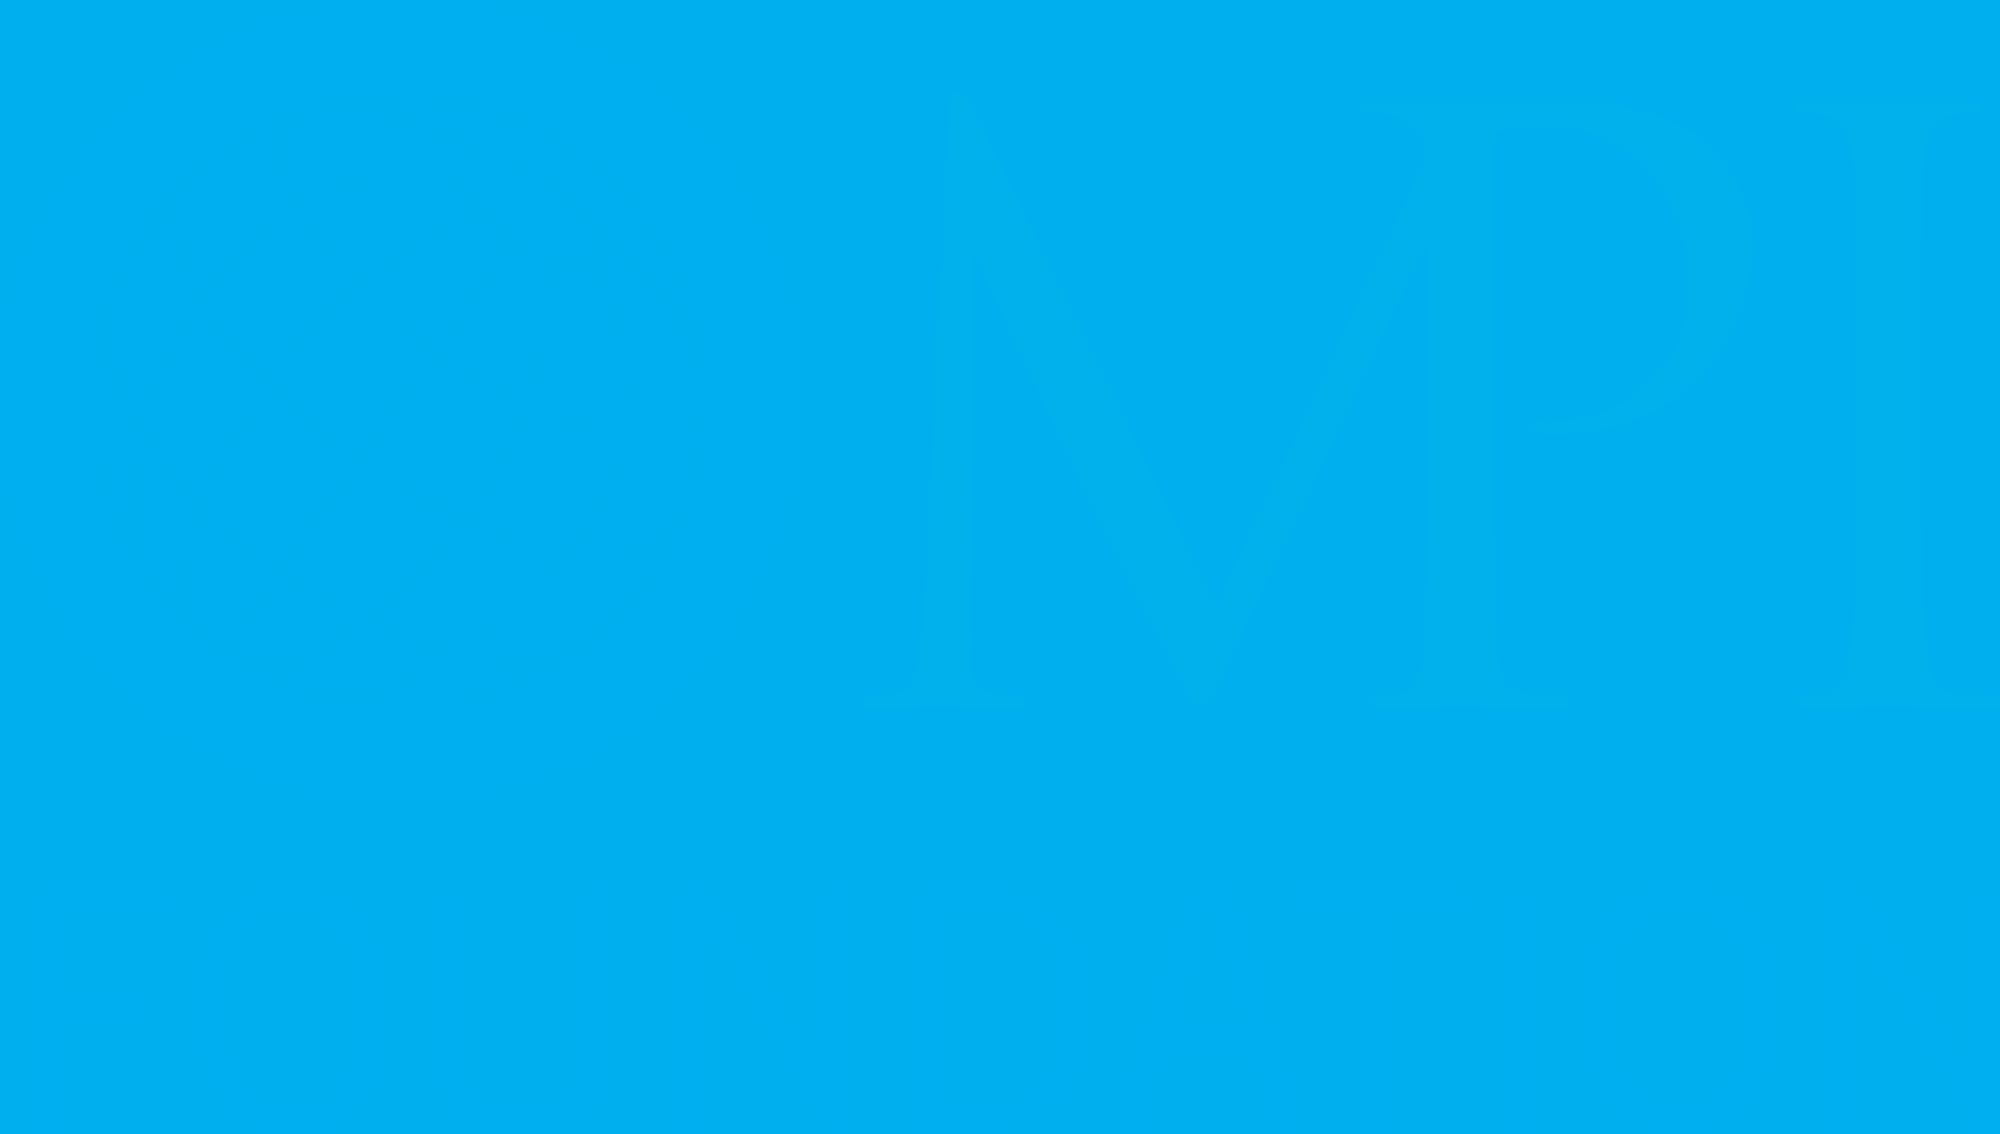 mpi foundation blue